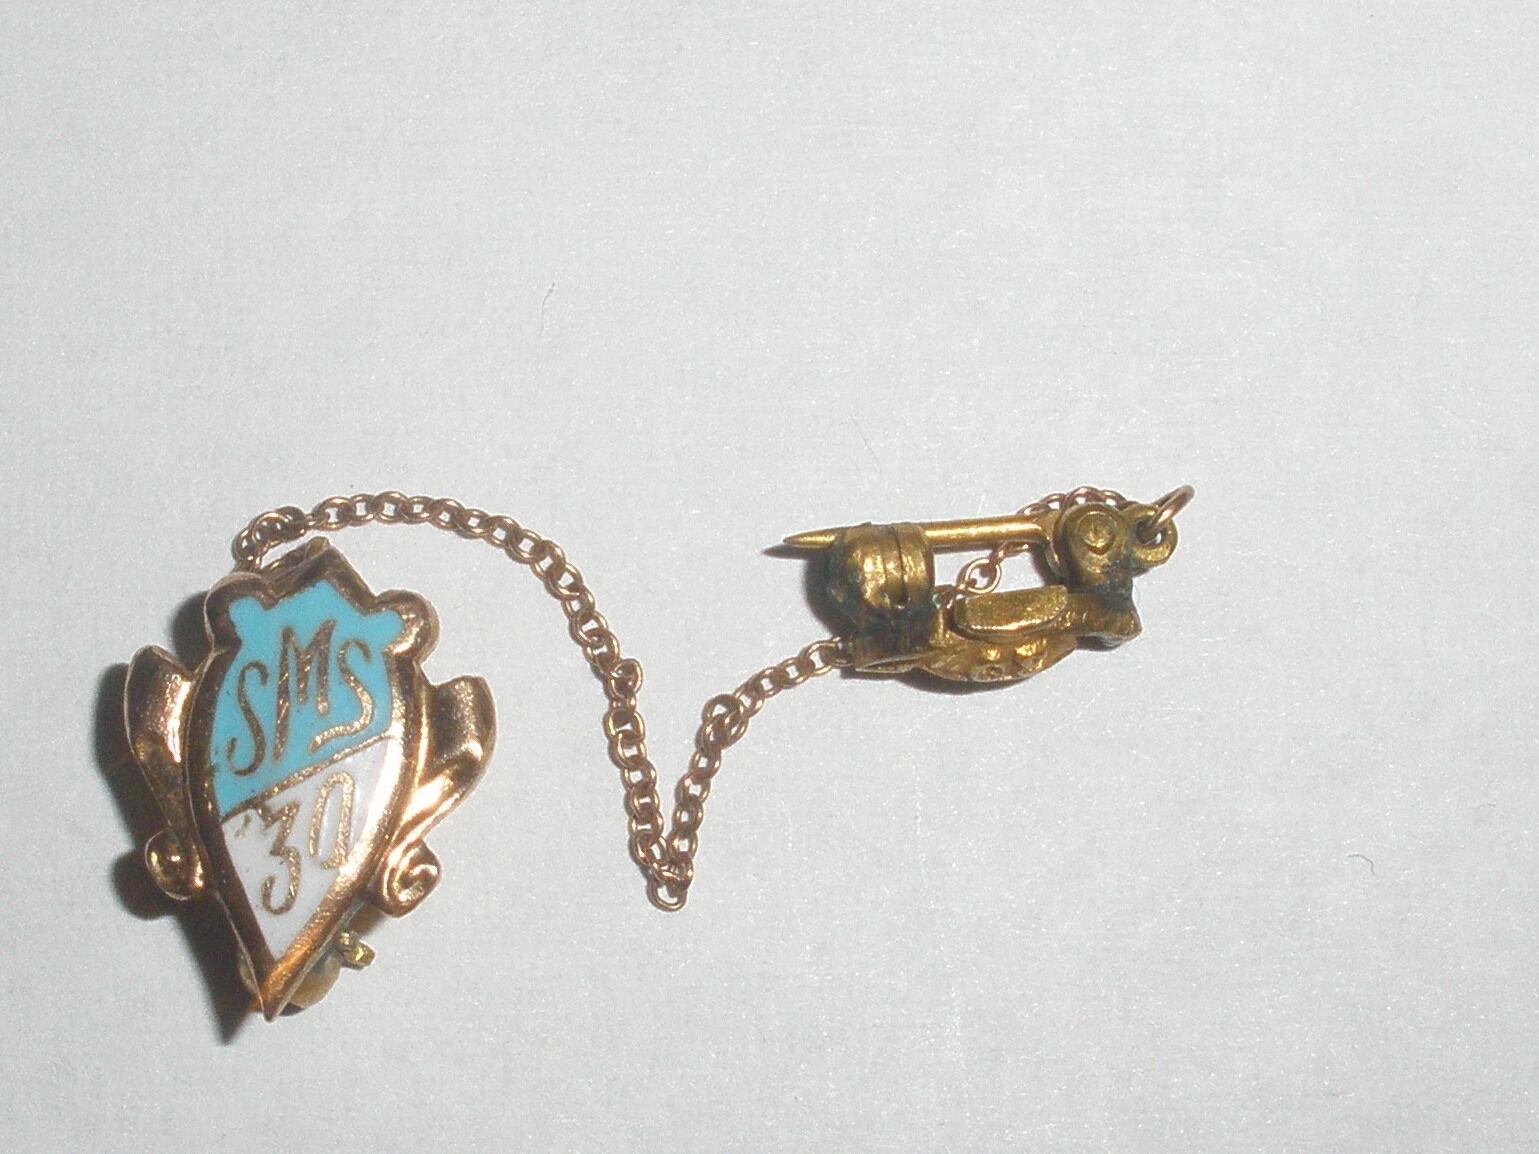 Vintage School Pin SMS 10k Yellow gold Enamel Medical School pin chain 30